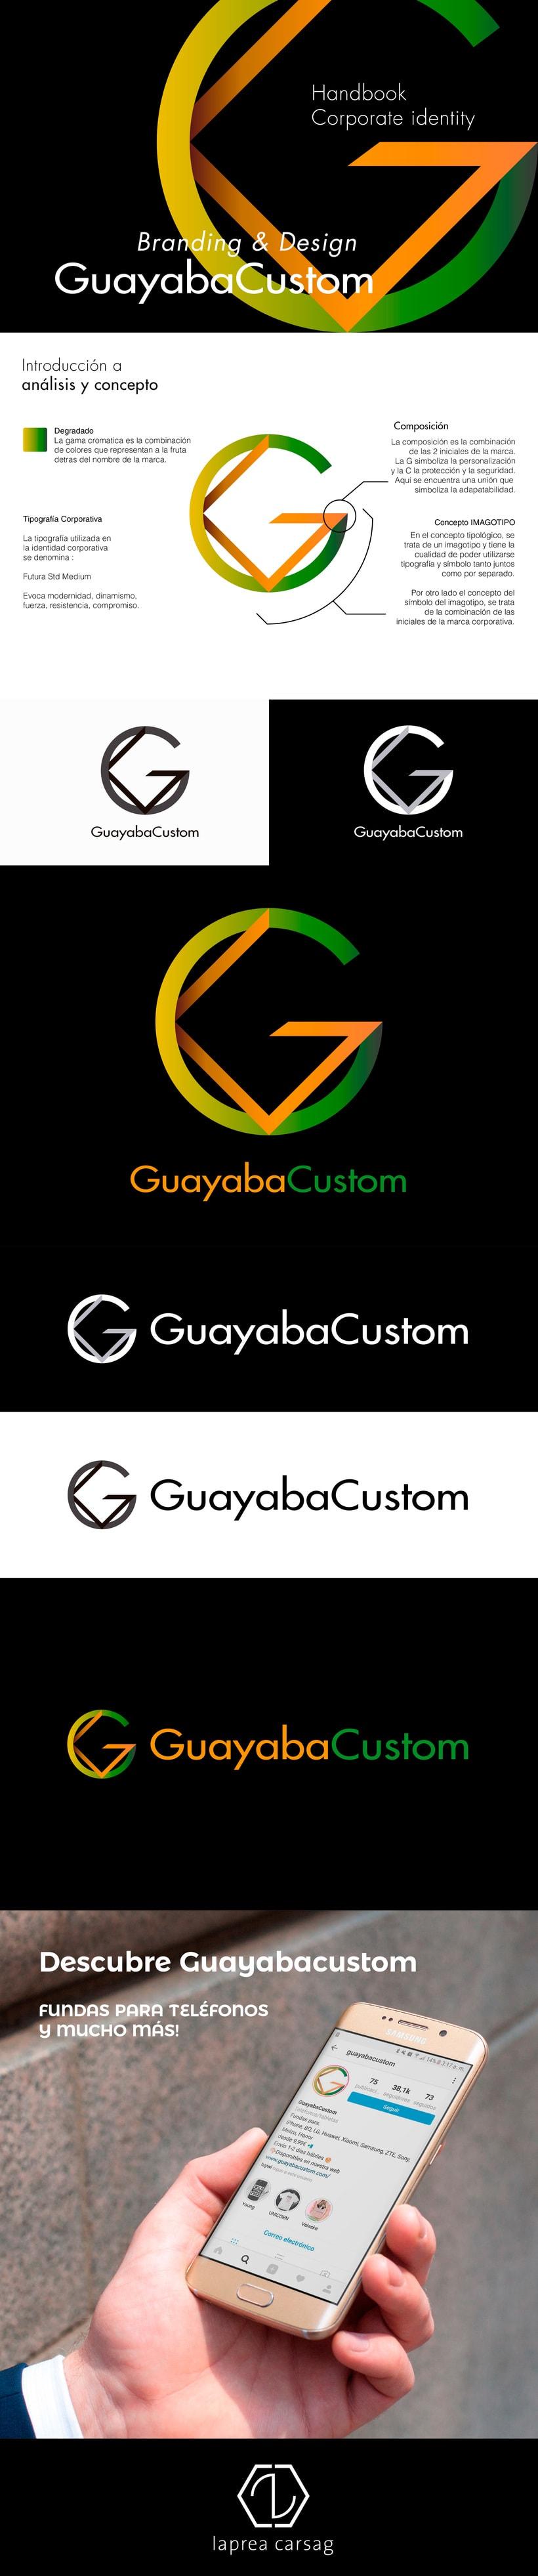 Marca corporativa Guayabacustom 0